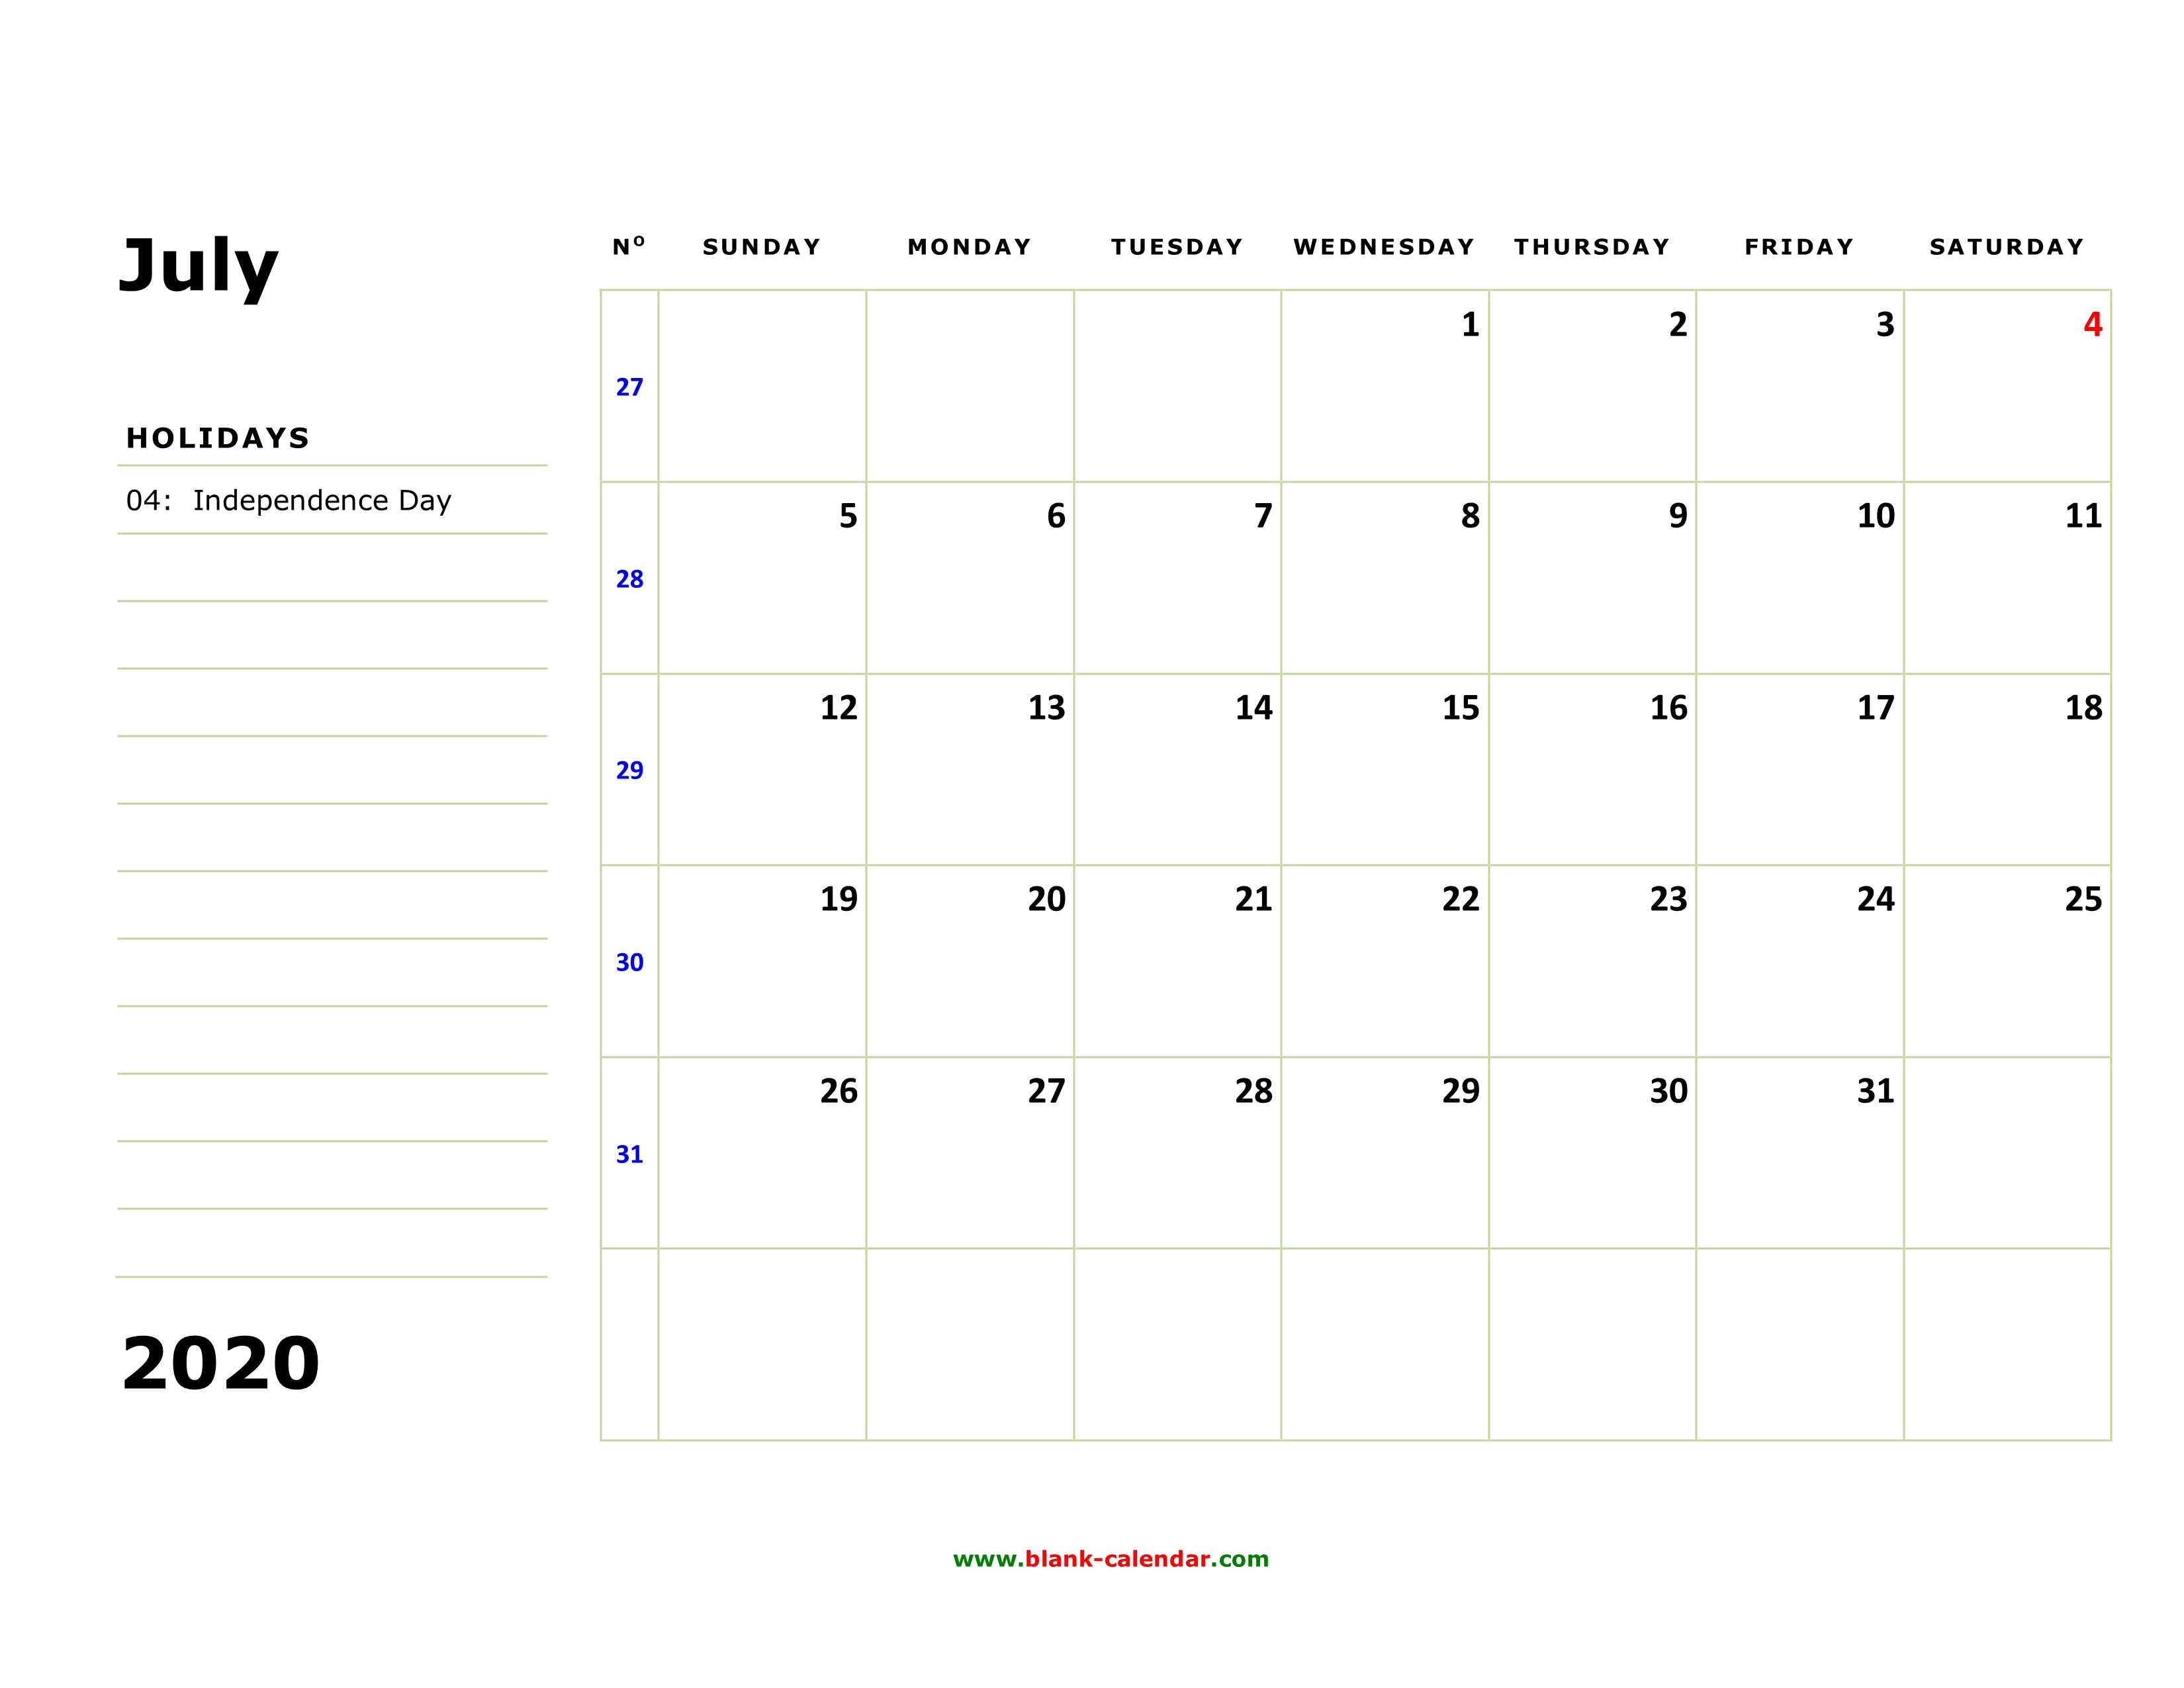 Free Download Printable July 2020 Calendar, Large Box, Holidays